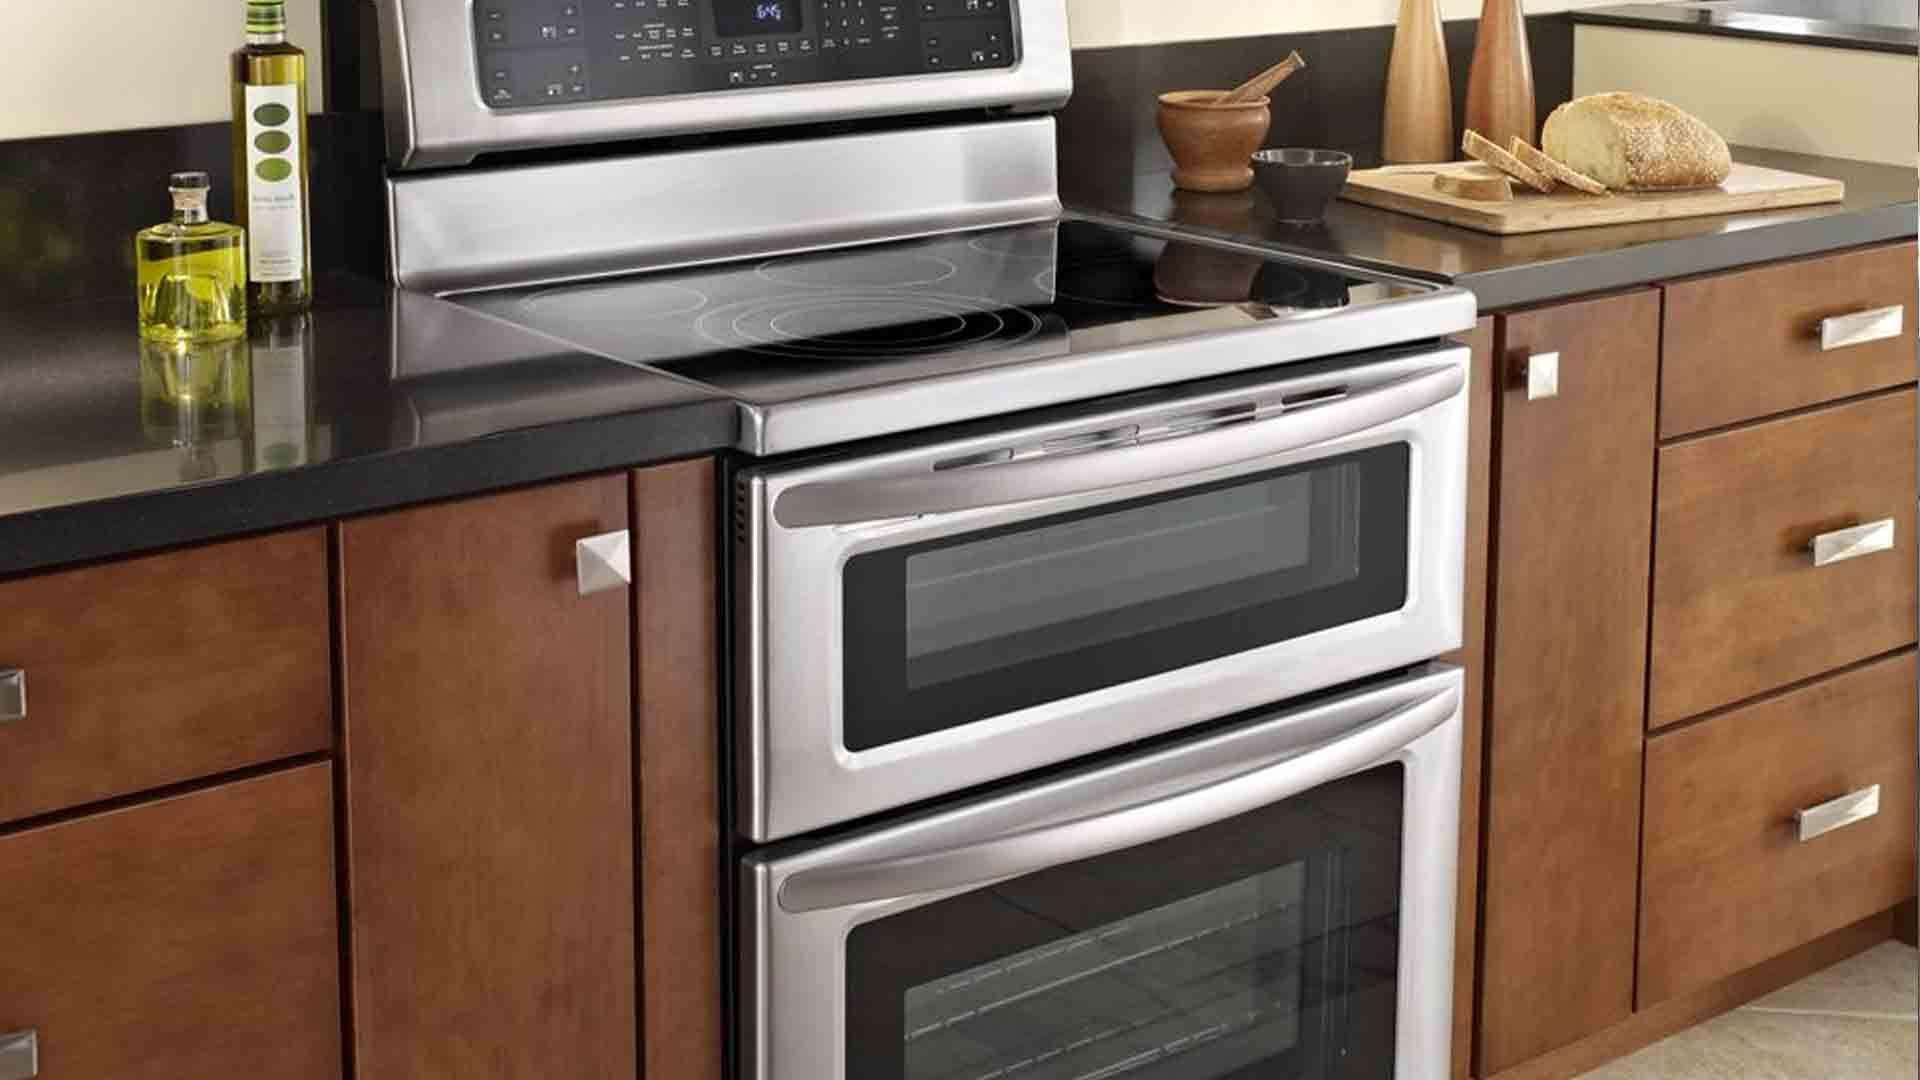 KitchenAid Electric Double Oven Range Repair | KitchenAid Repairs